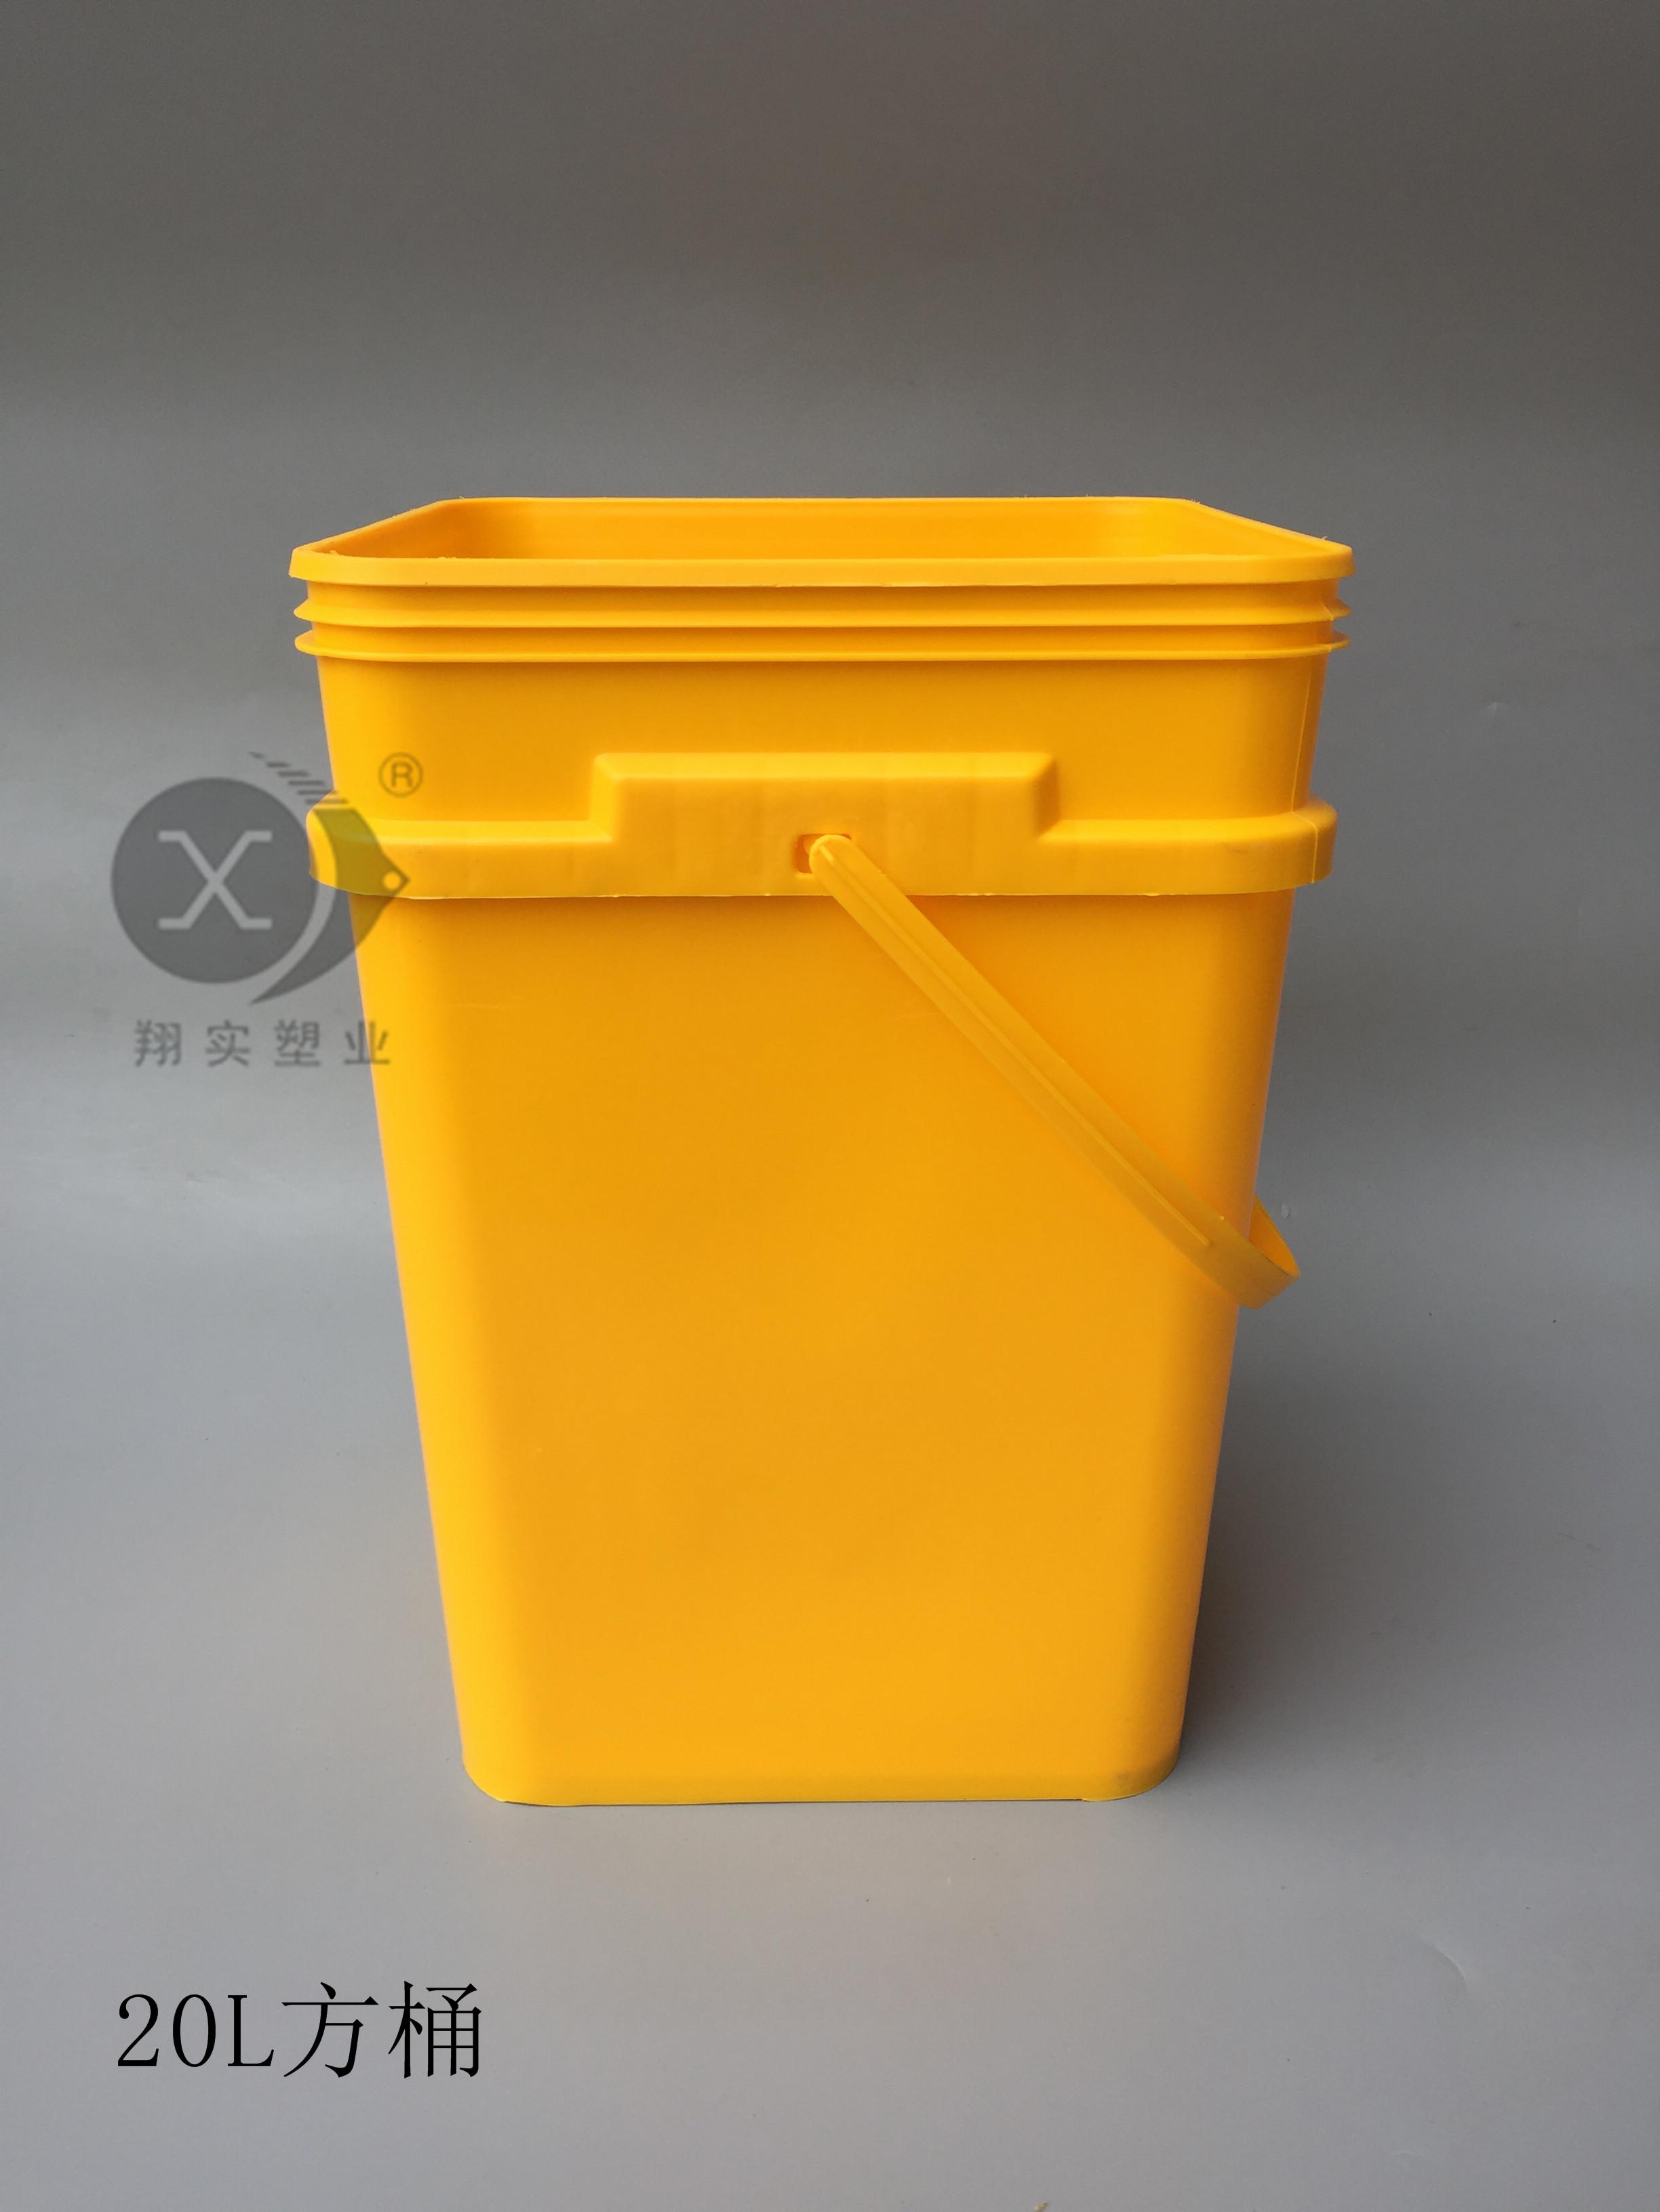 20L垃圾分类tong